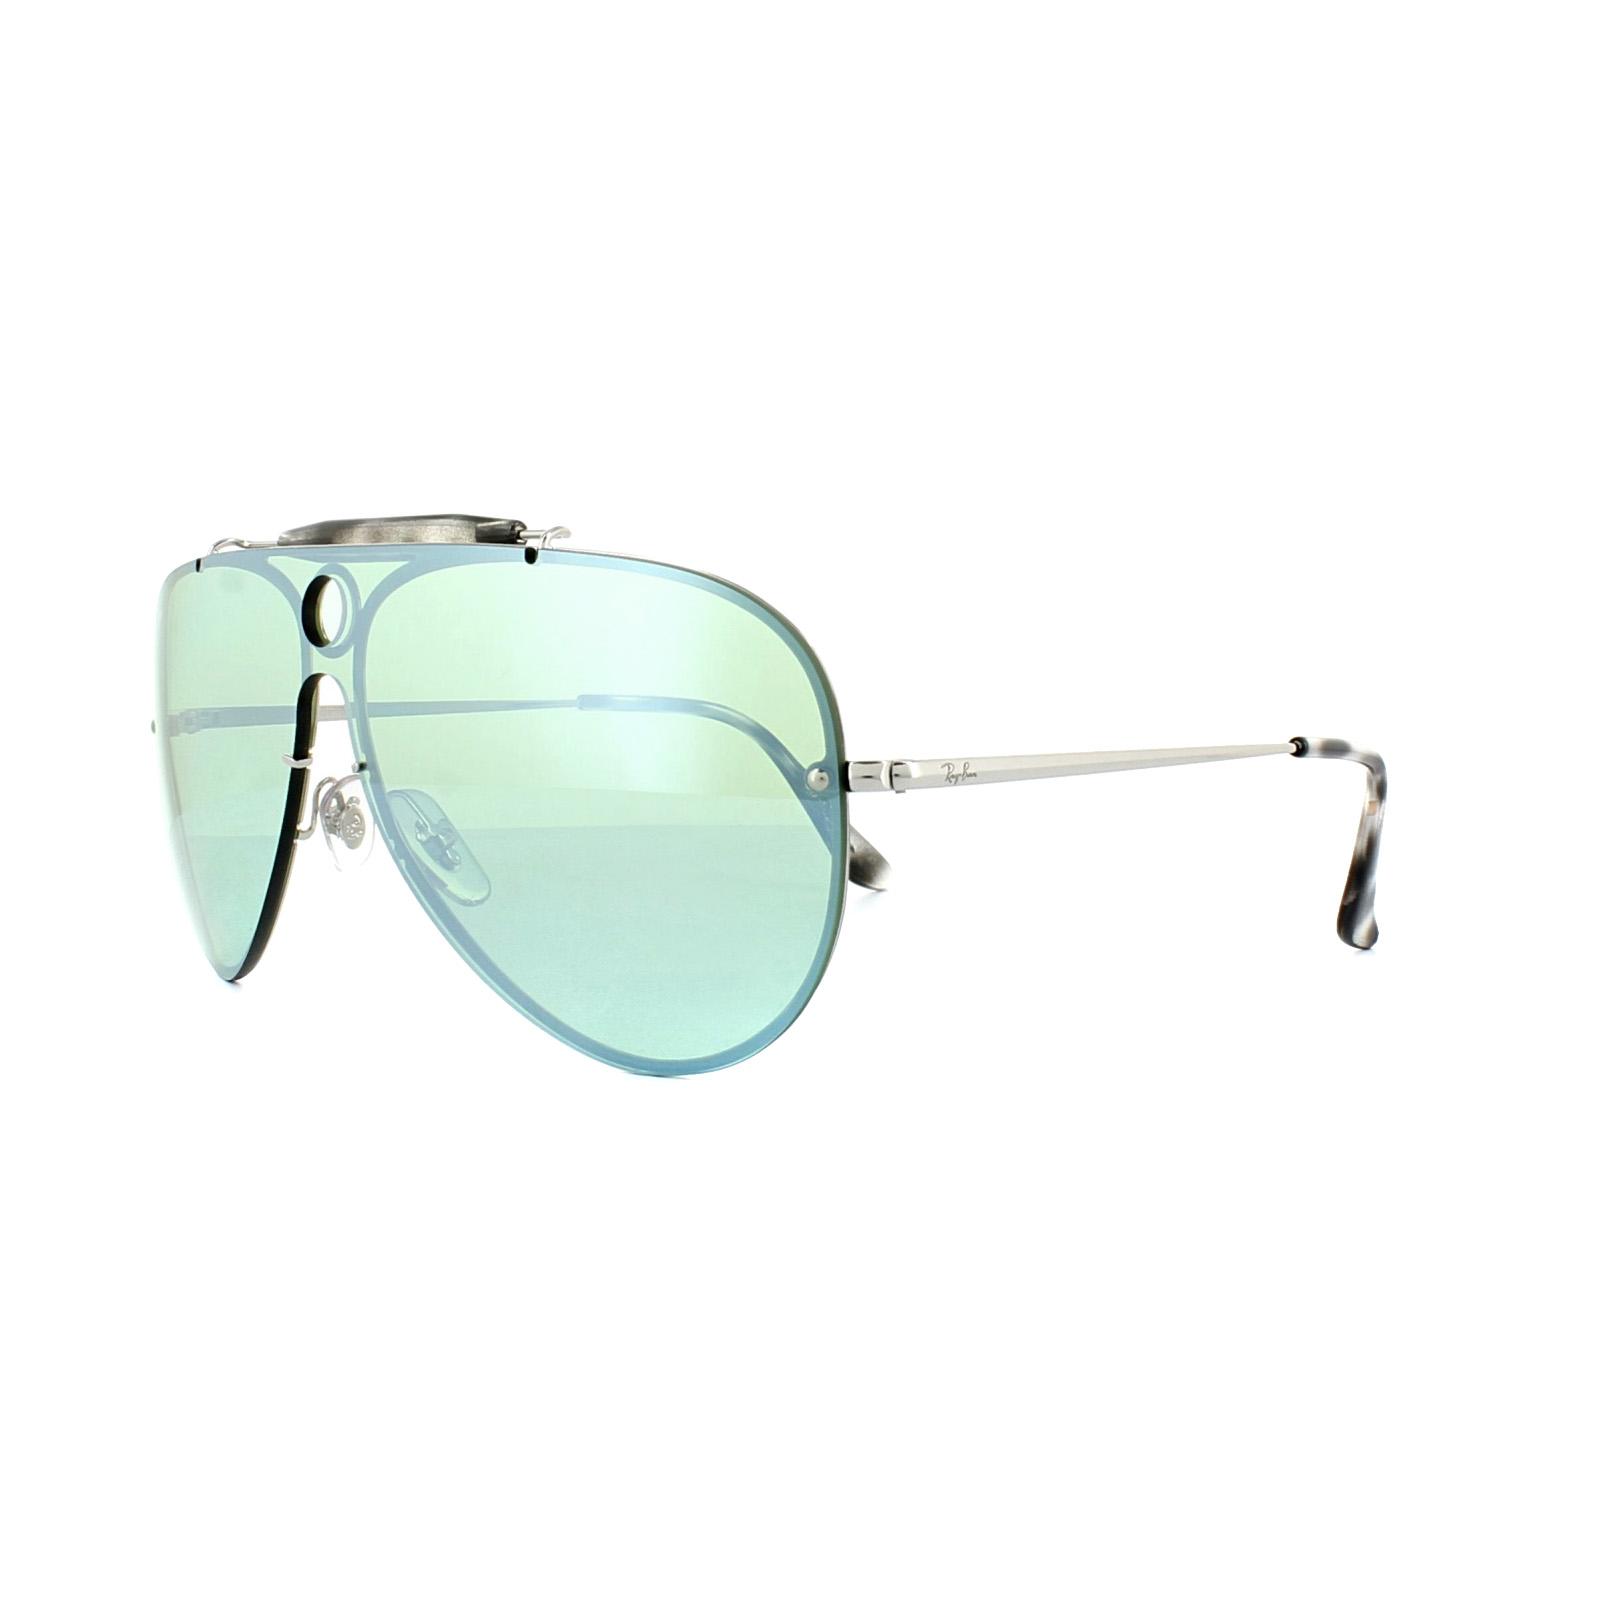 4a4131523f4f3 Cheap Ray-Ban Blaze Shooter 3581N Sunglasses - Discounted Sunglasses